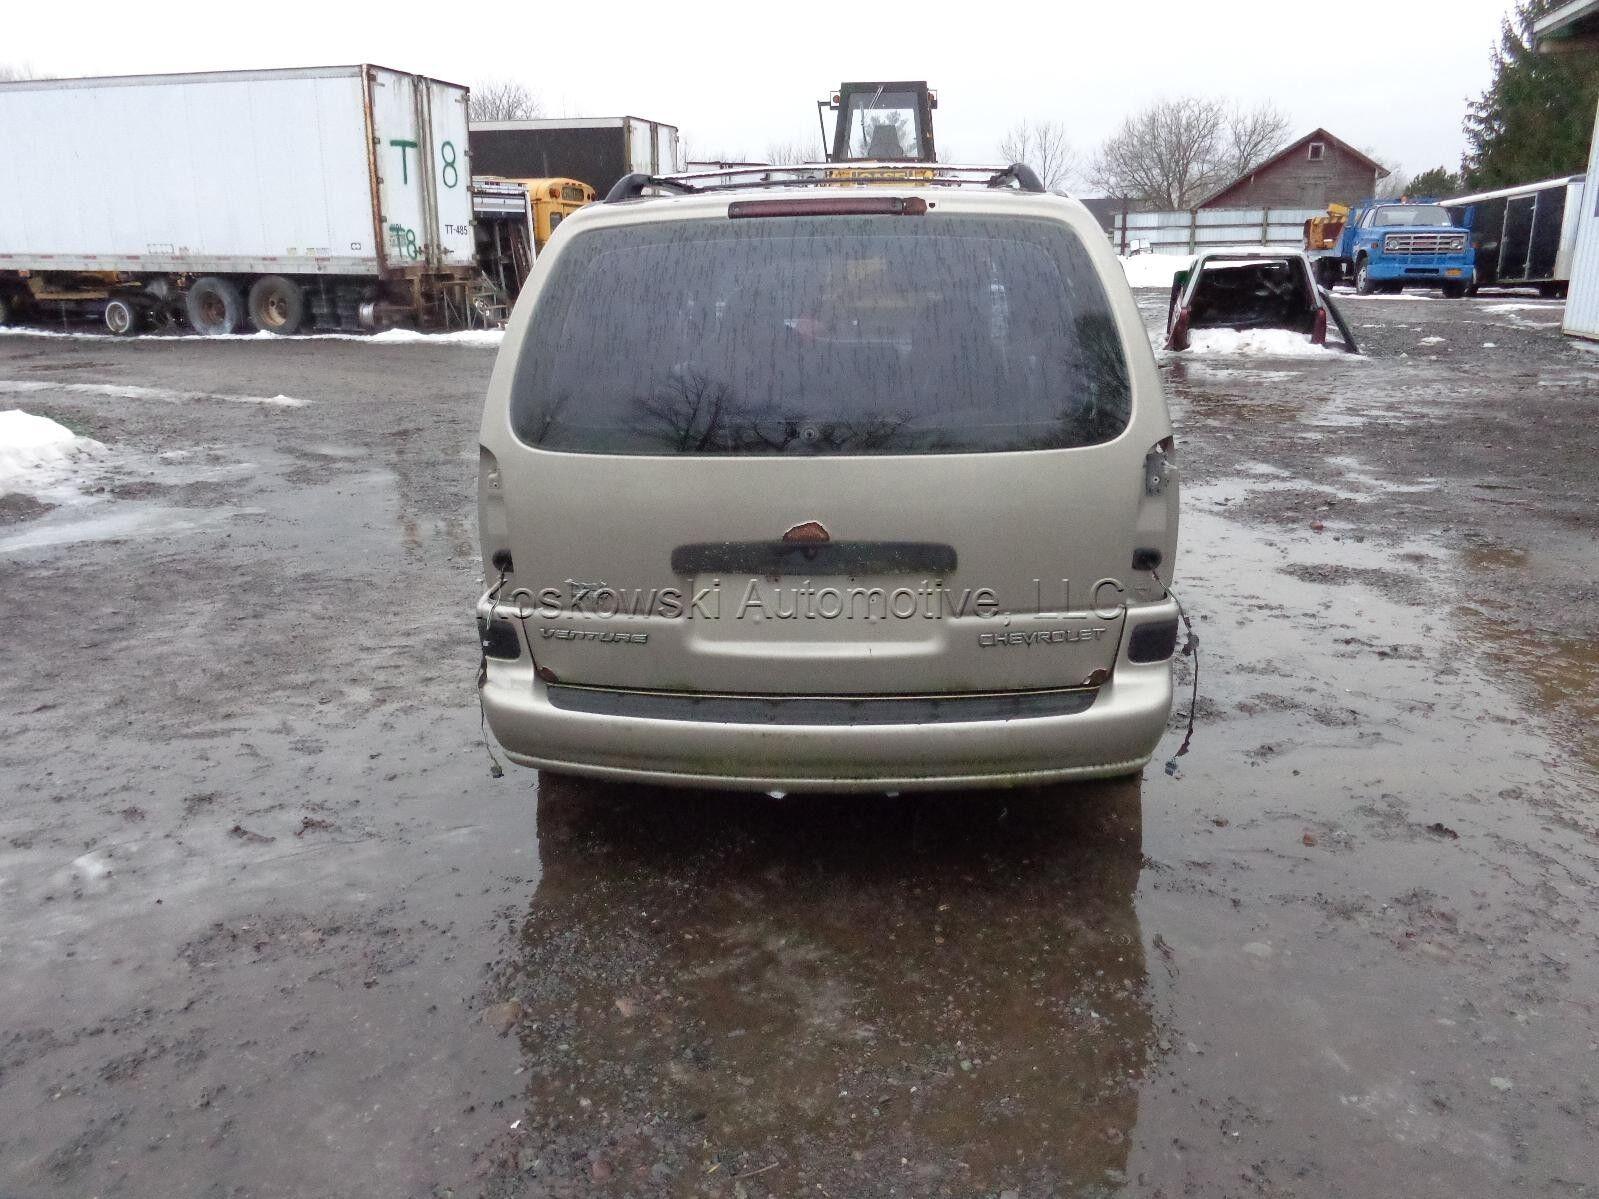 All Chevy 2008 chevy venture van : Used Chevrolet Venture Locks & Hardware for Sale